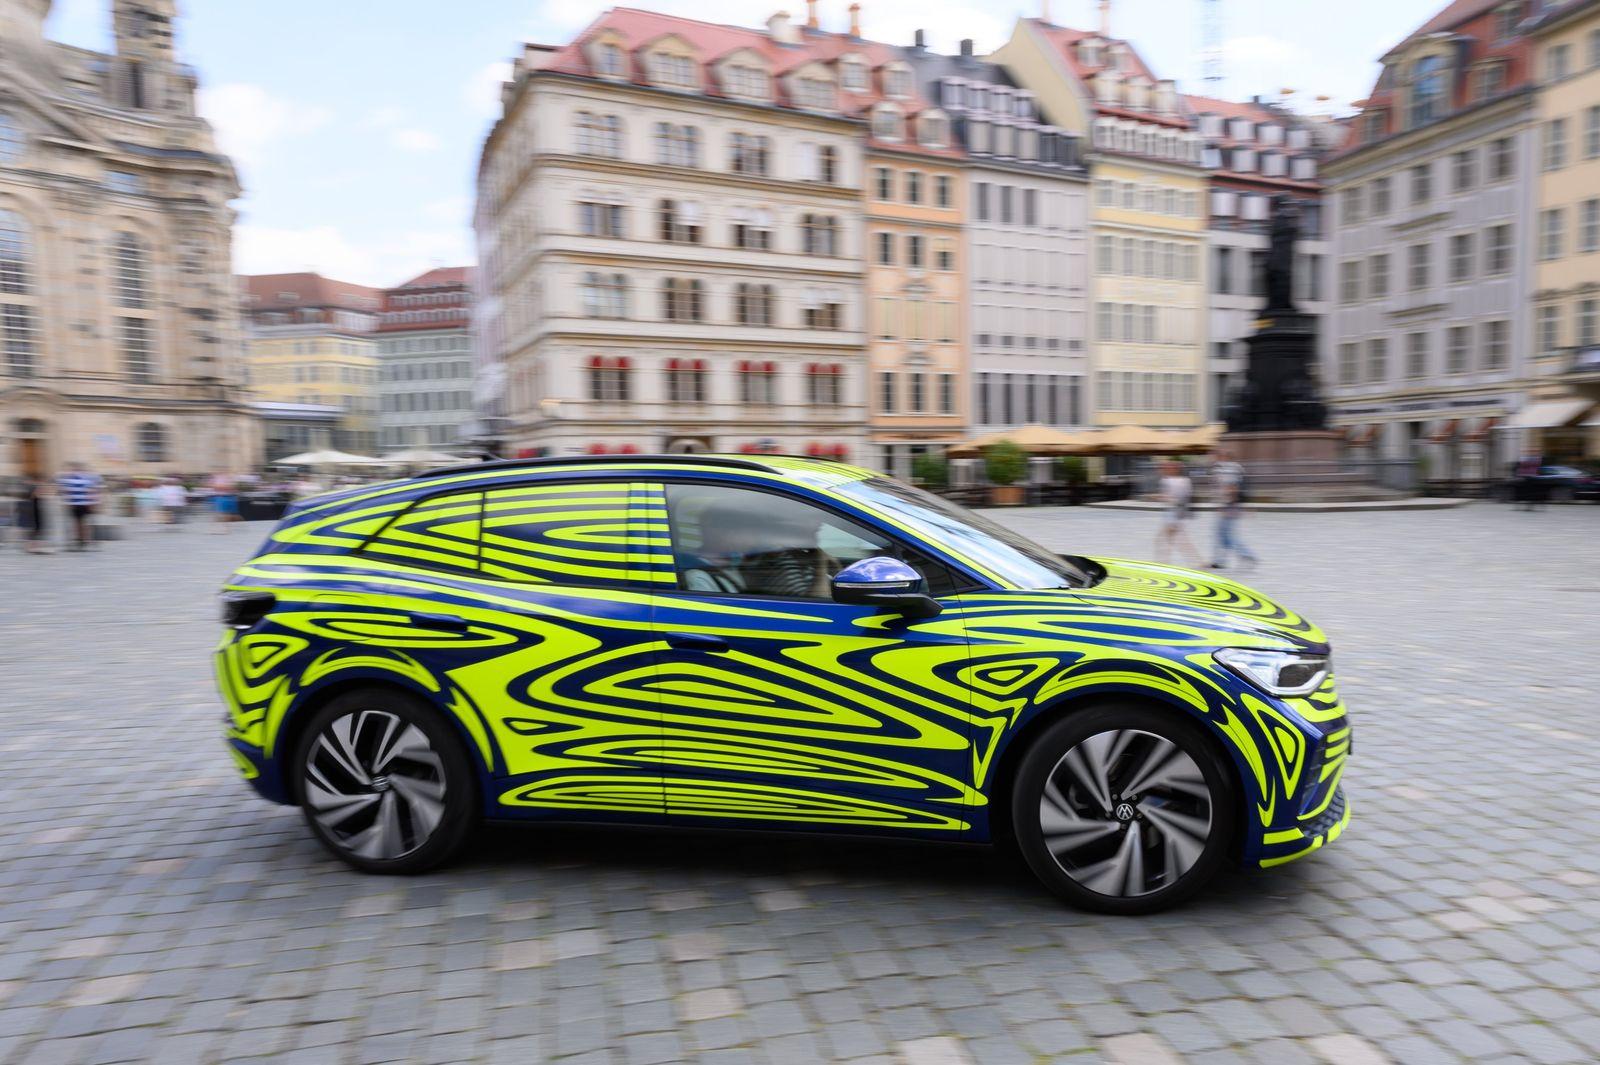 ID.4 ergänzt ID.3: VW baut jetzt in Zwickau zweites E-Modell